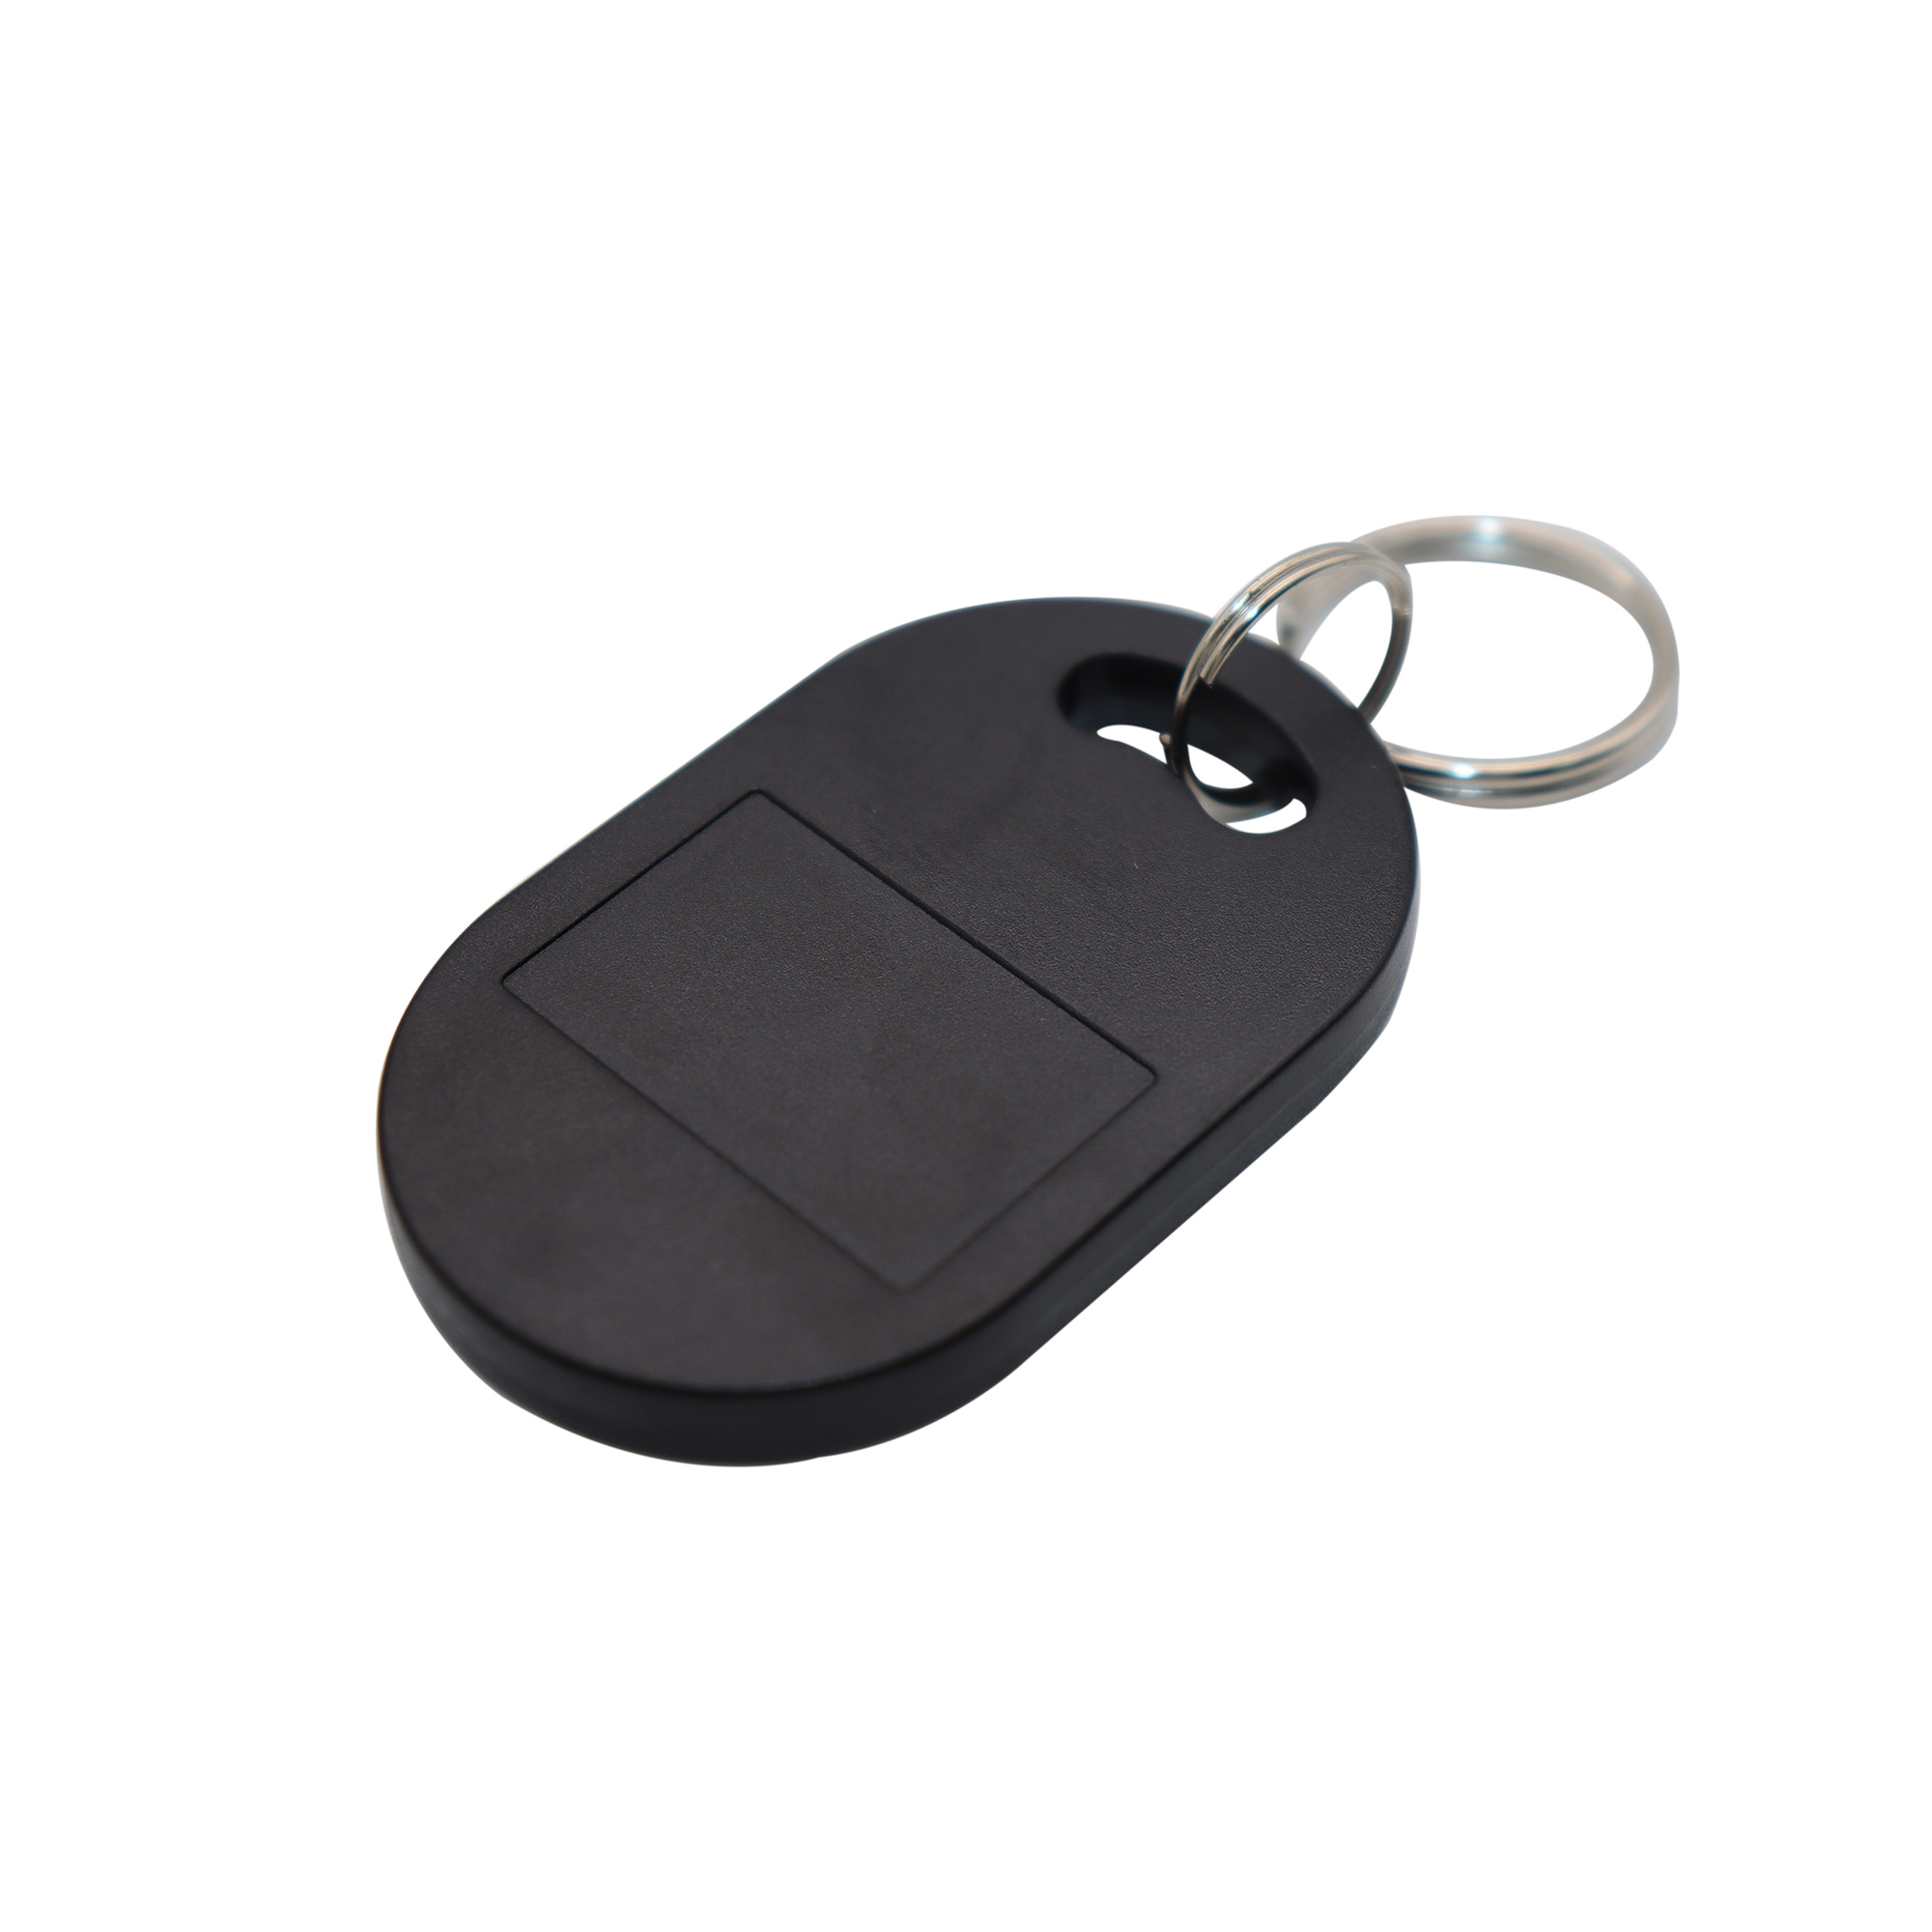 Chaveiro Proximidade 13.56mhz Tag RFID MIFARE Giga Security C/ 2 Unidades